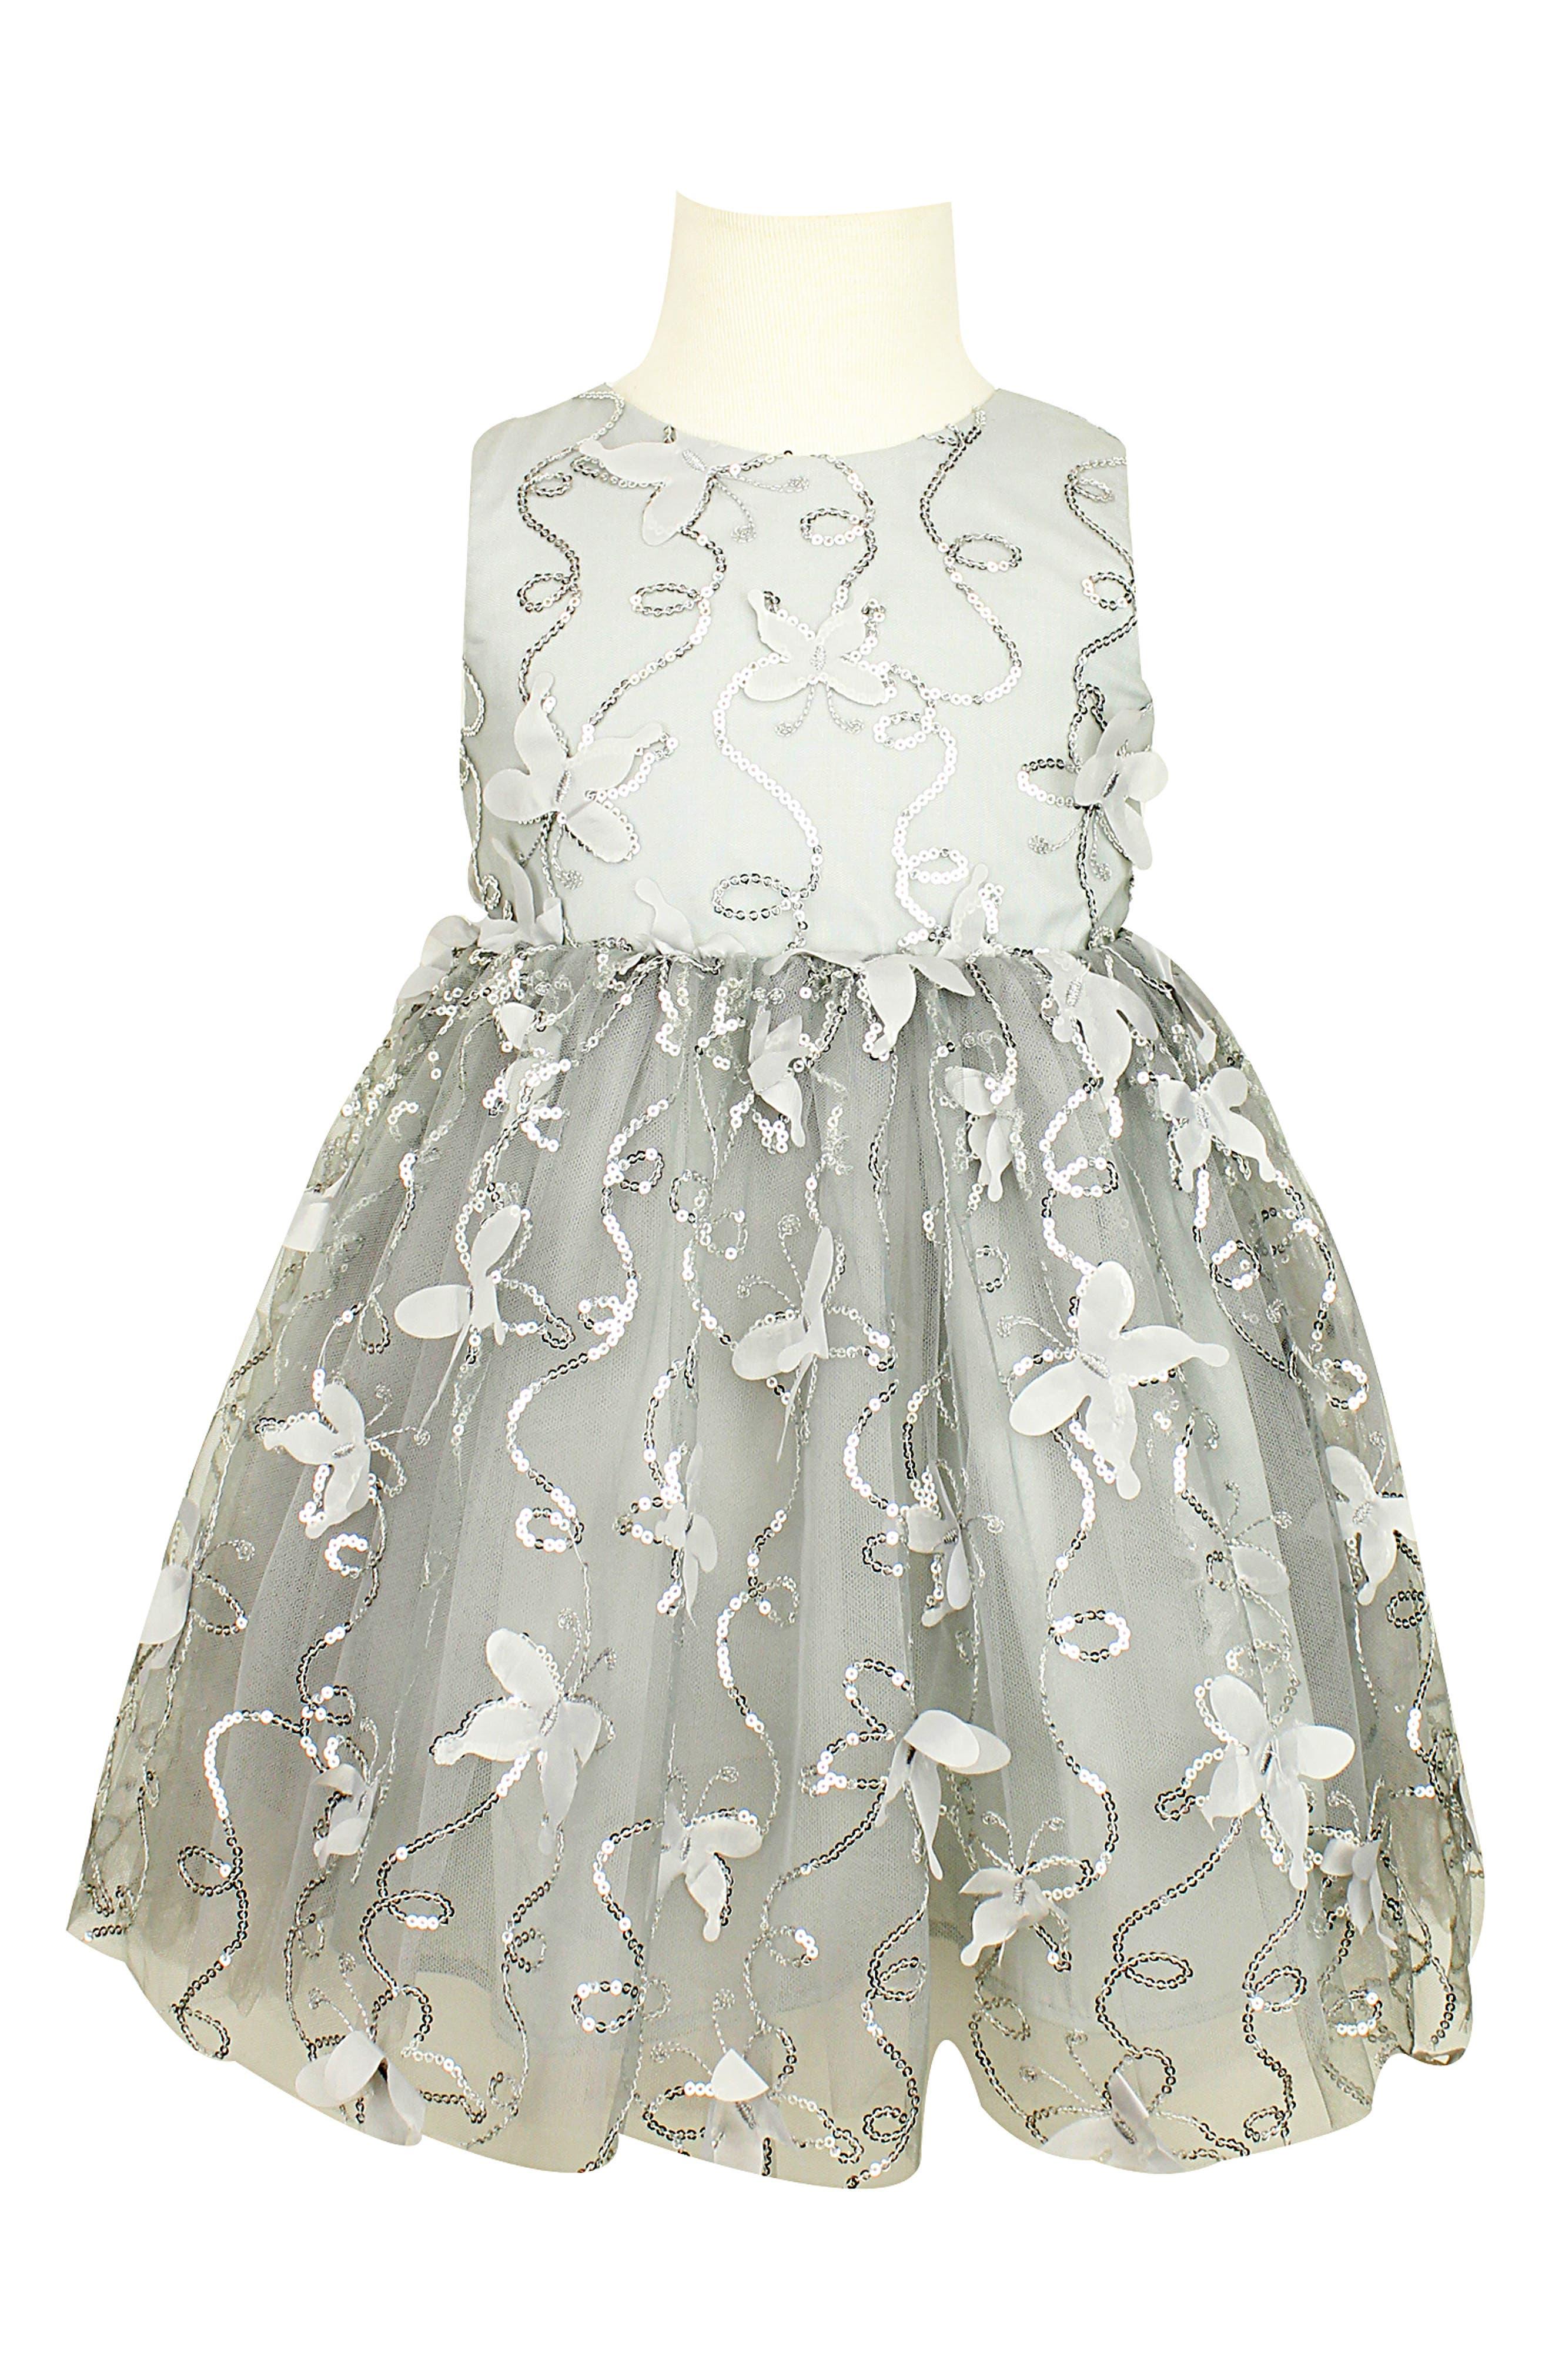 Image of Popatu Floral Applique Tulle Dress